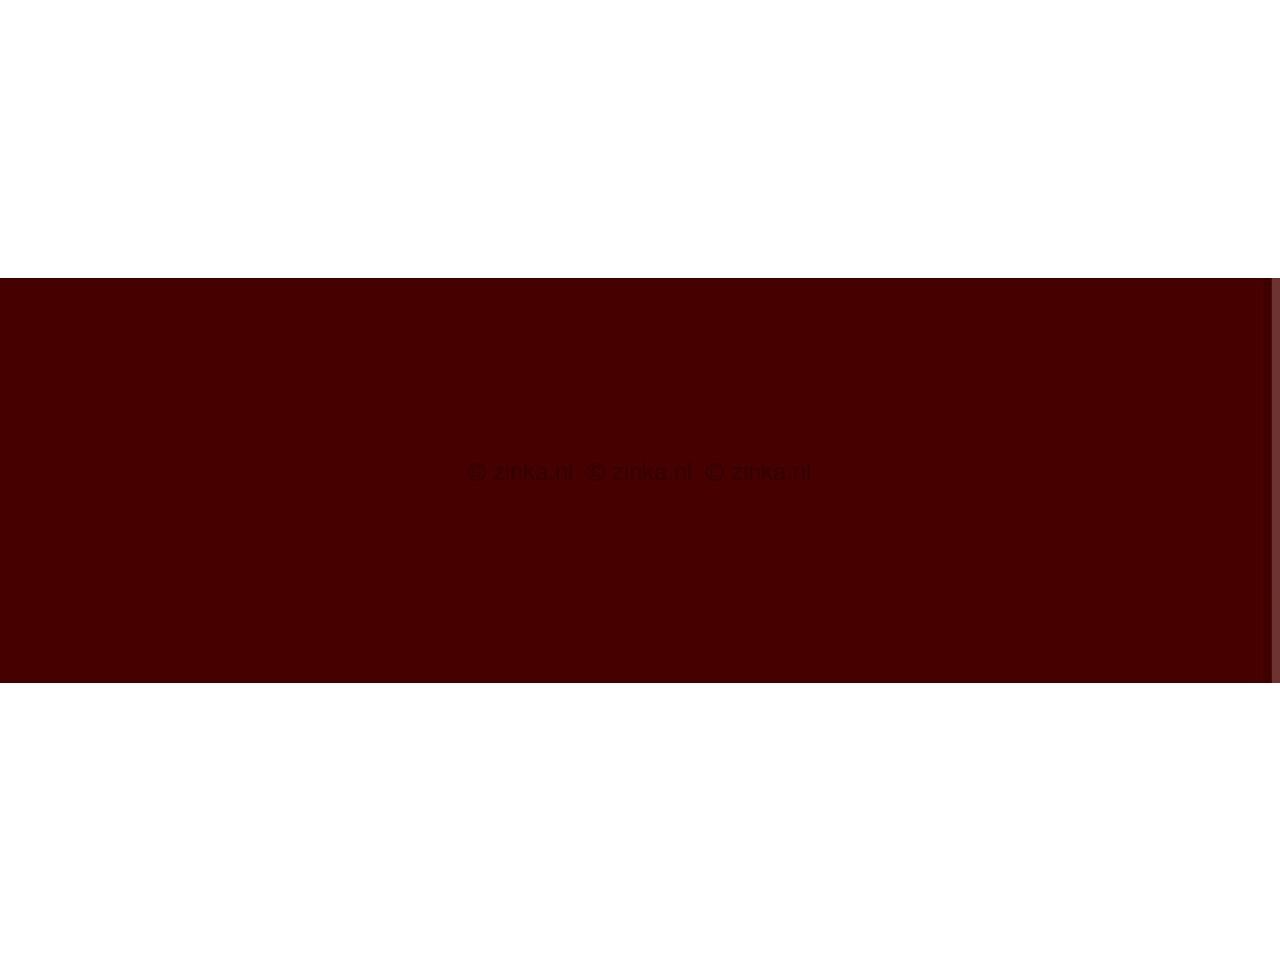 Buitenhout primer rood bruin